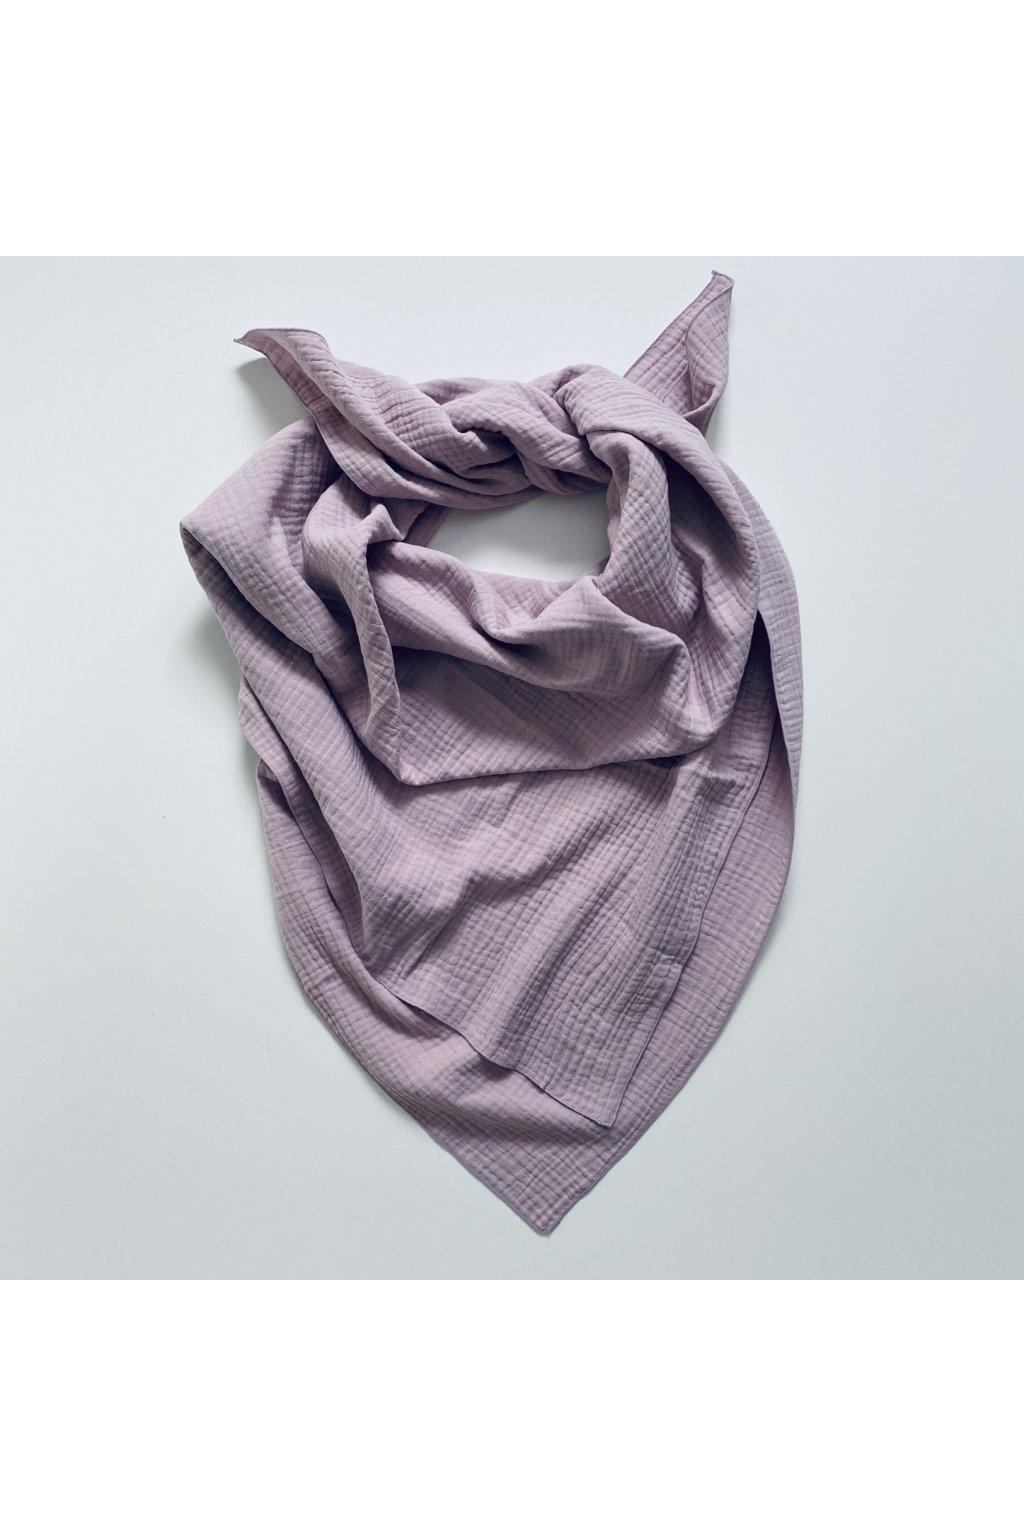 Dámská šála a taška 2v1 růžová